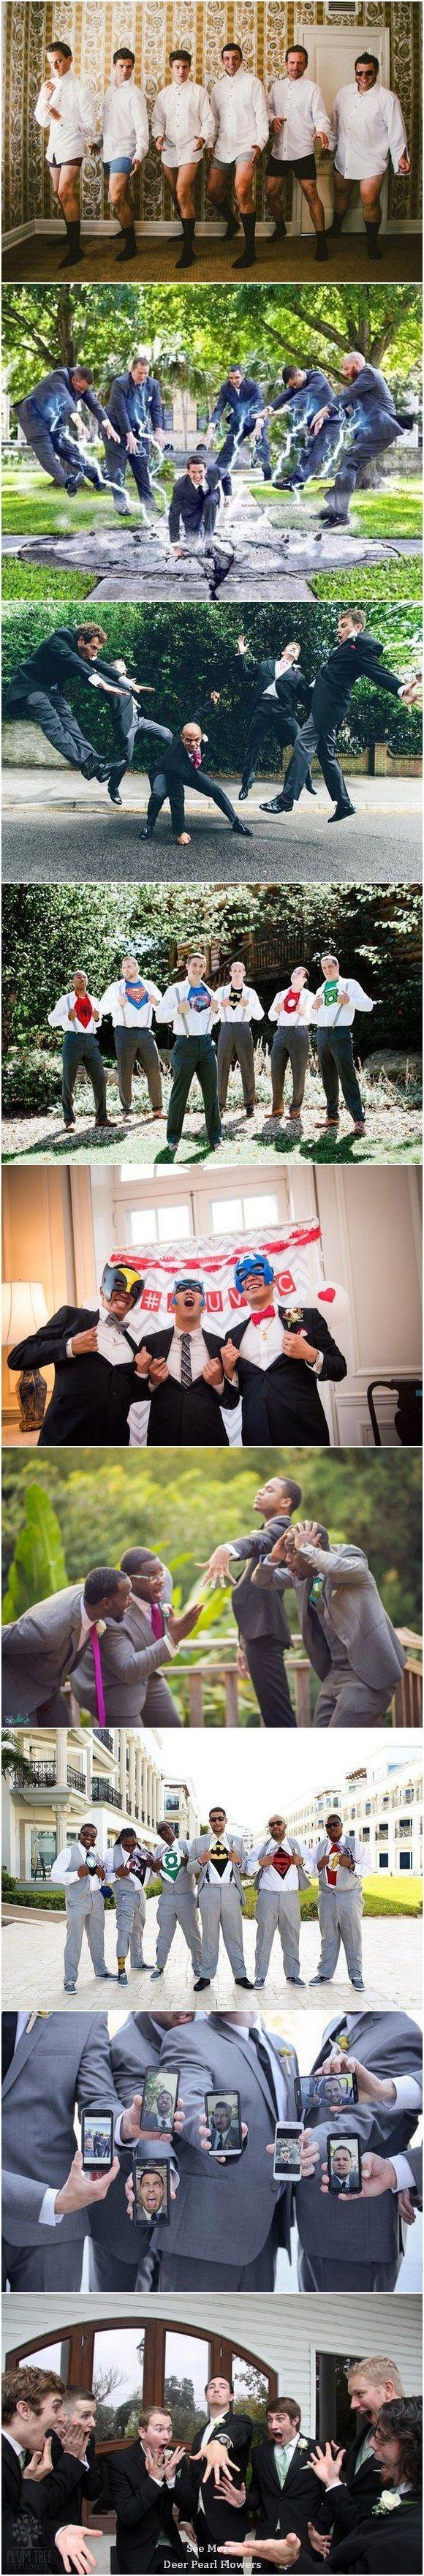 funny groomsmen wedding photo ideas / http://www.deerpearlflowers.com/fun-groomsmen-photo-ideas-and-poses/?utm_content=buffer5460e&utm_medium=social&utm_source=pinterest.com&utm_campaign=buffer Find your inspo at www.pinterest.com/laurenweds/wedding-photography?utm_content=bufferb3a14&utm_medium=social&utm_source=pinterest.com&utm_campaign=buffer